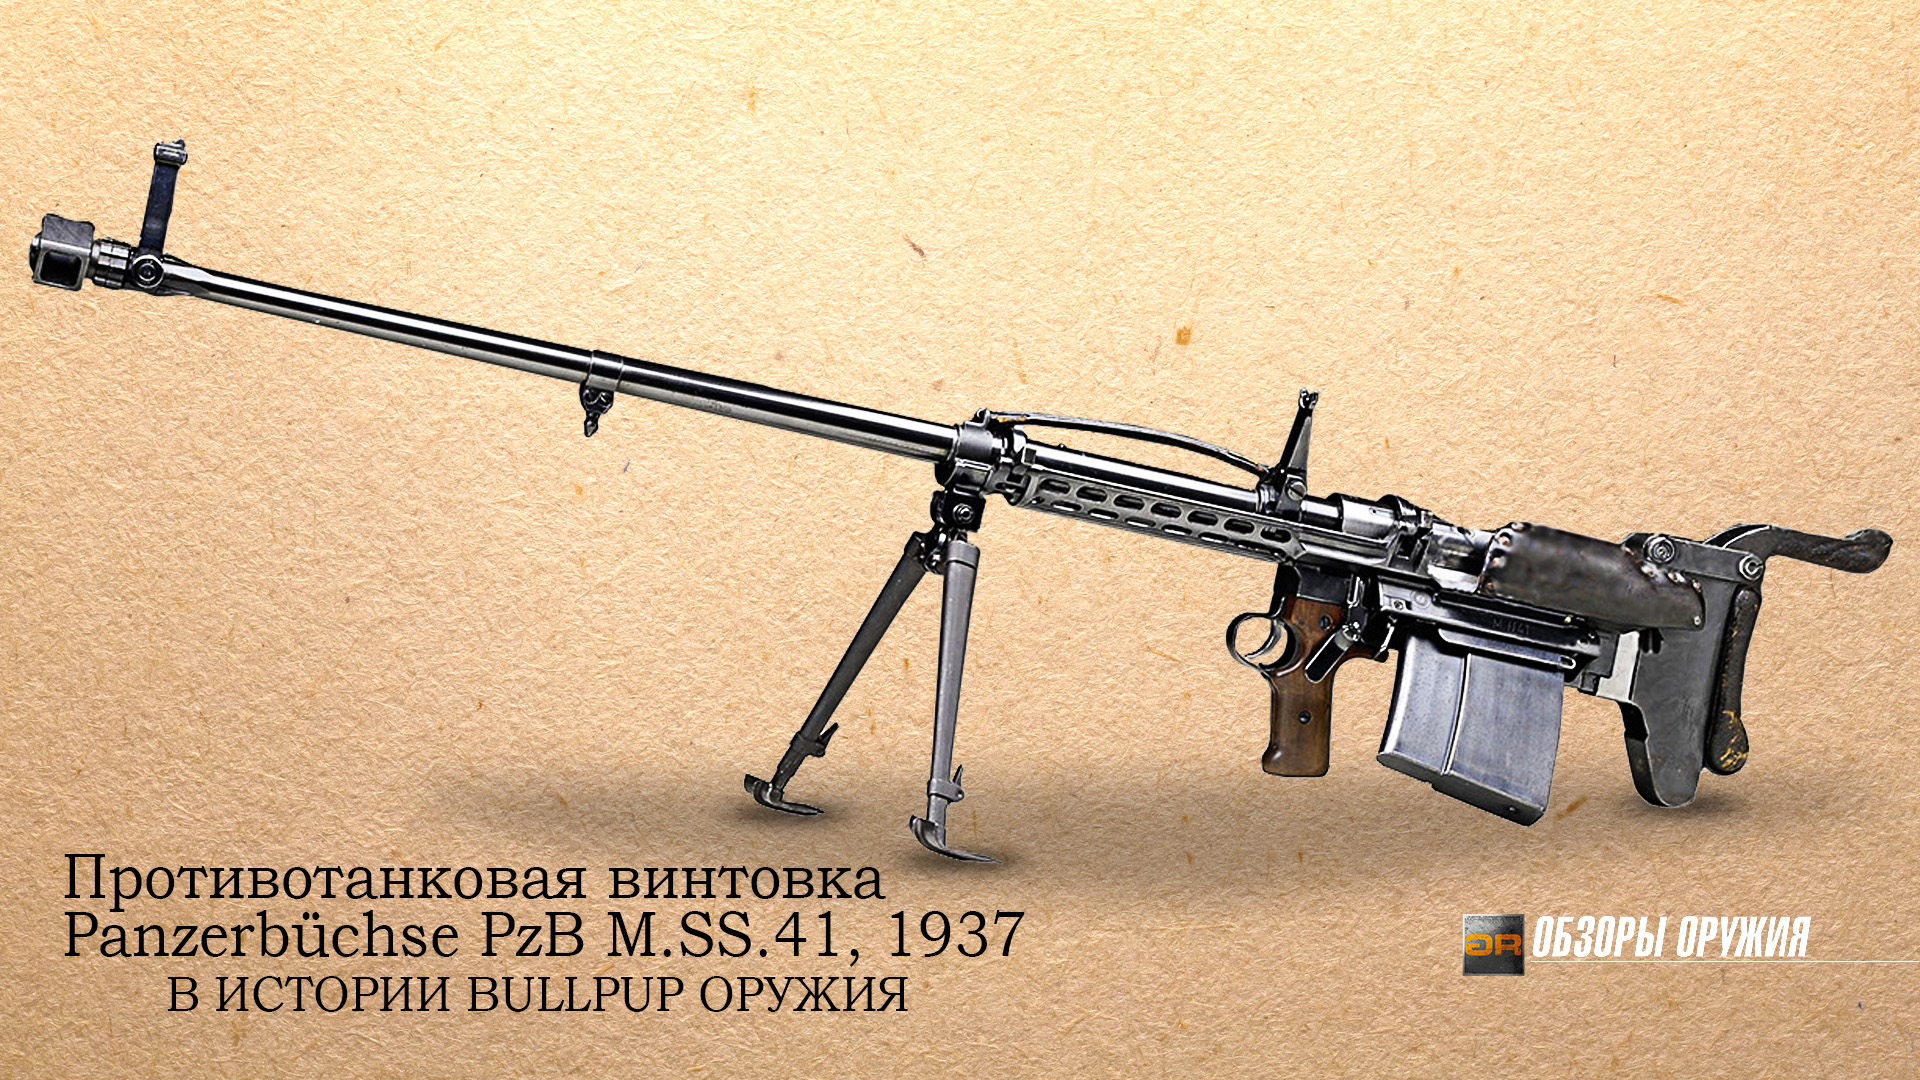 Противотанковая винтовка Panzerbüchse Pz